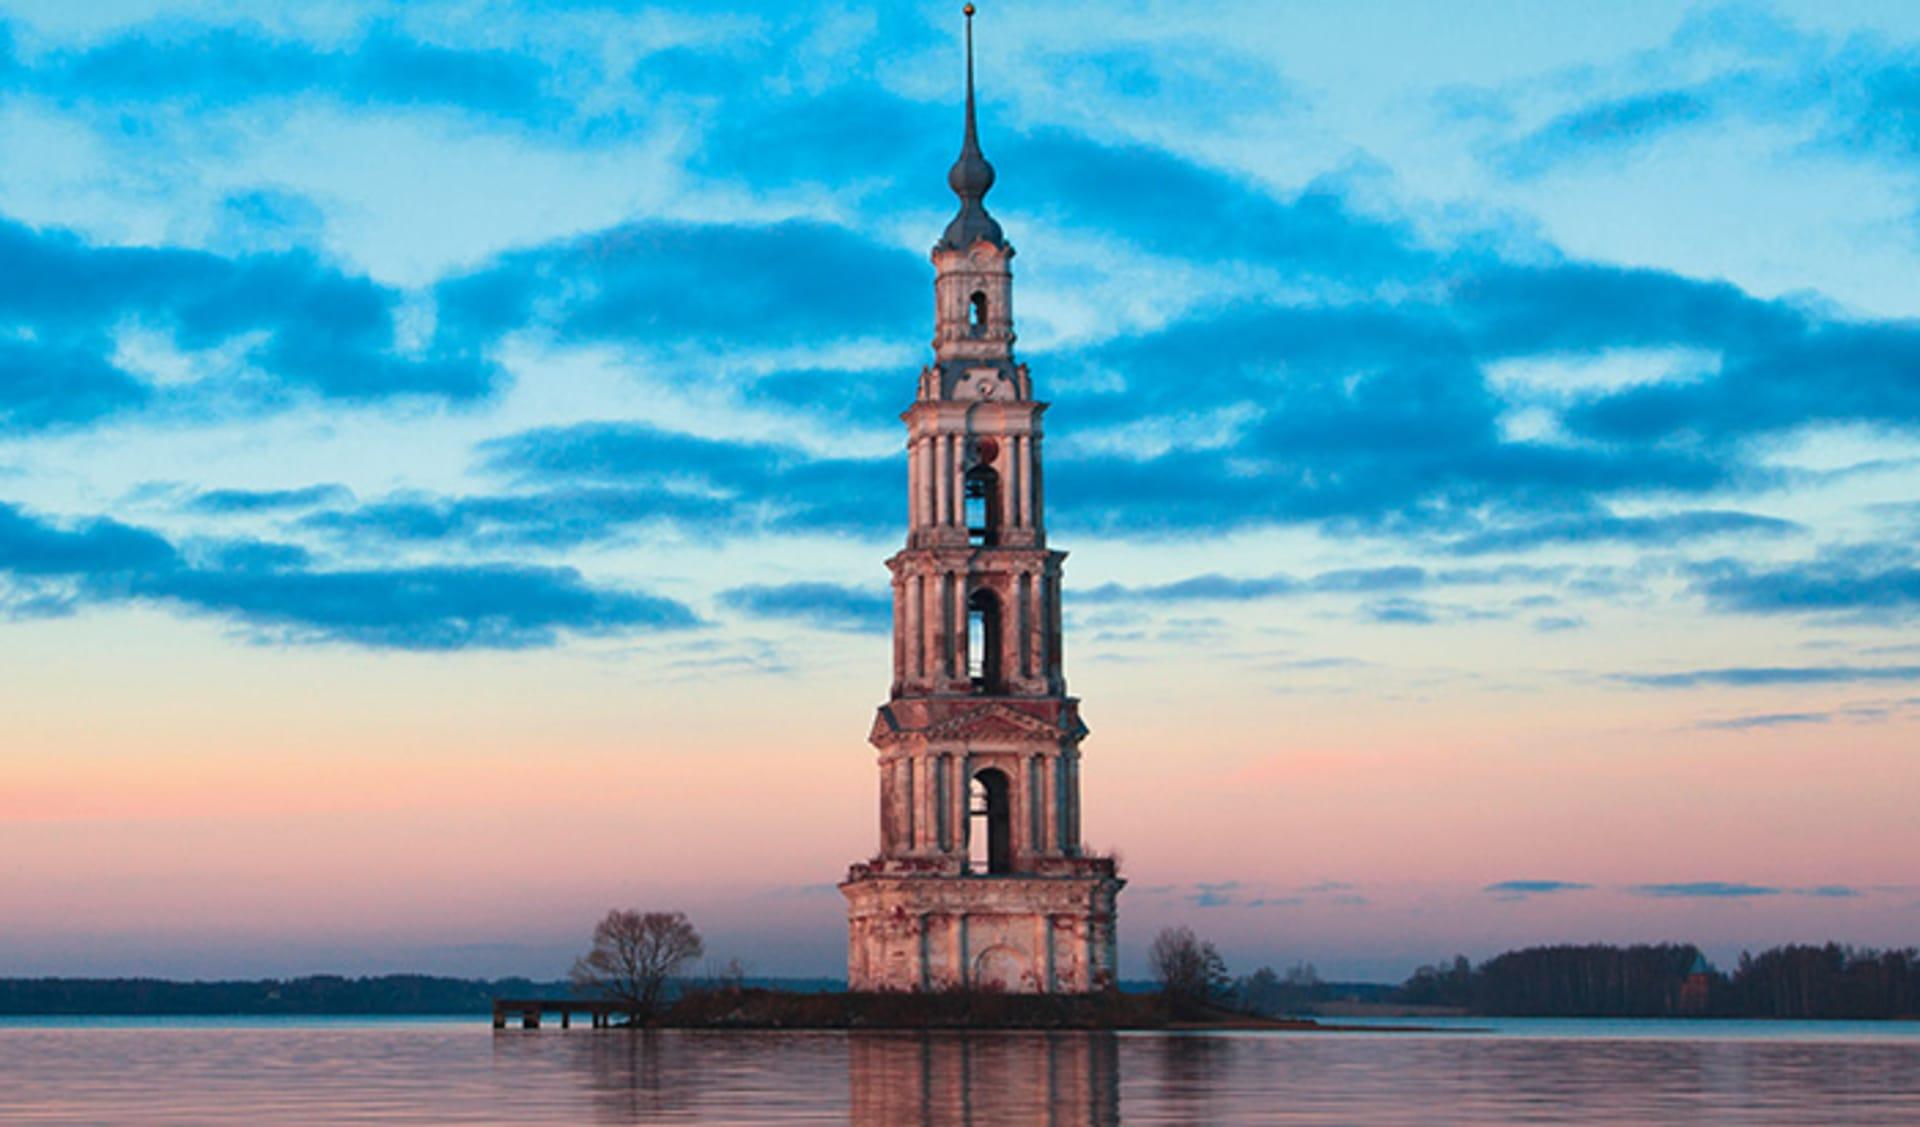 Flooded Belltower, Volga, Kalyazin, Russland